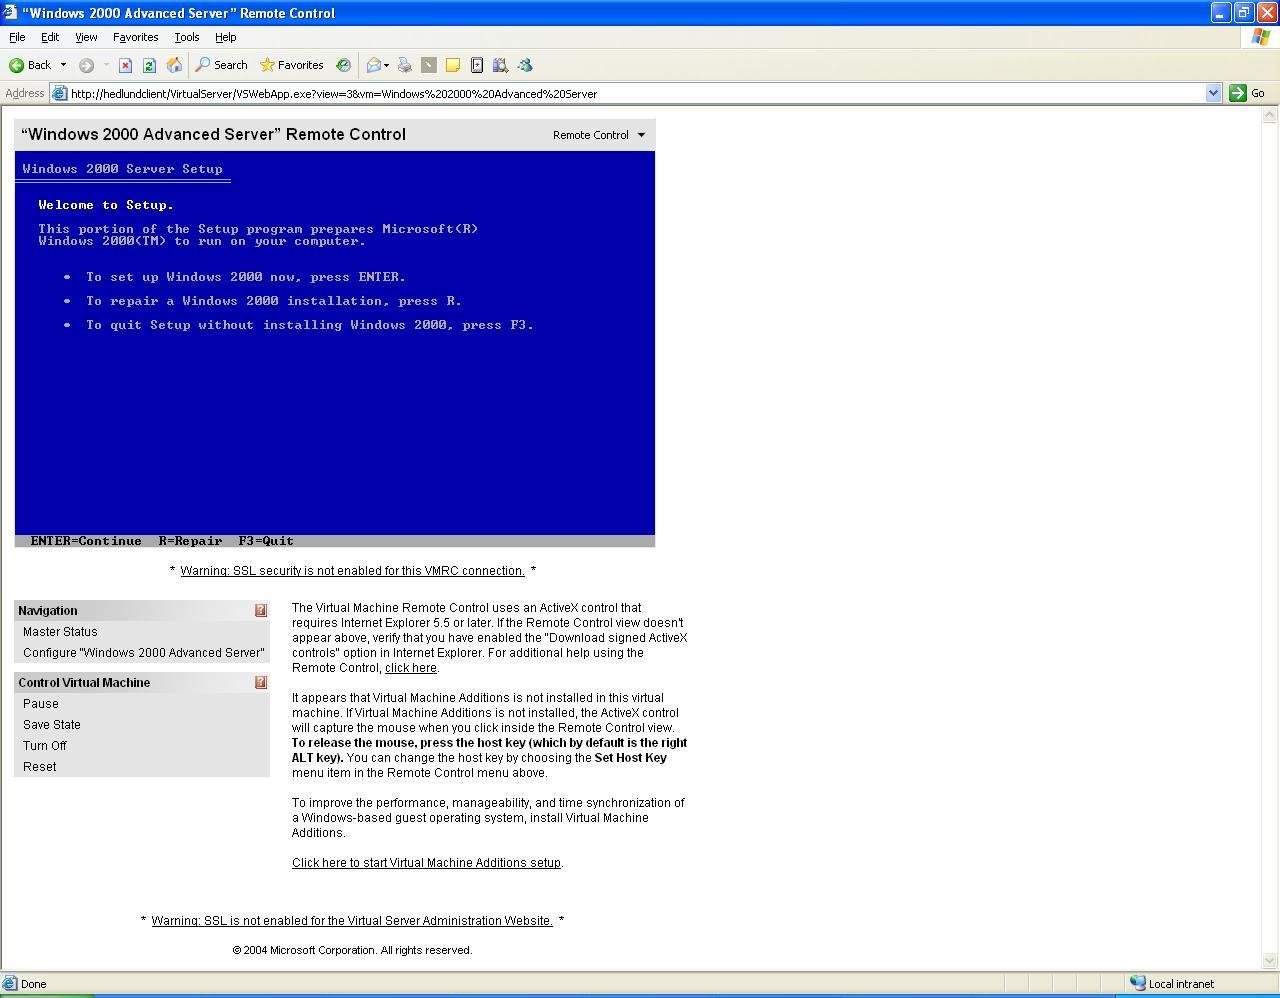 ActiveWin com: Virtual Server 2005 Enterprise Edition - Review